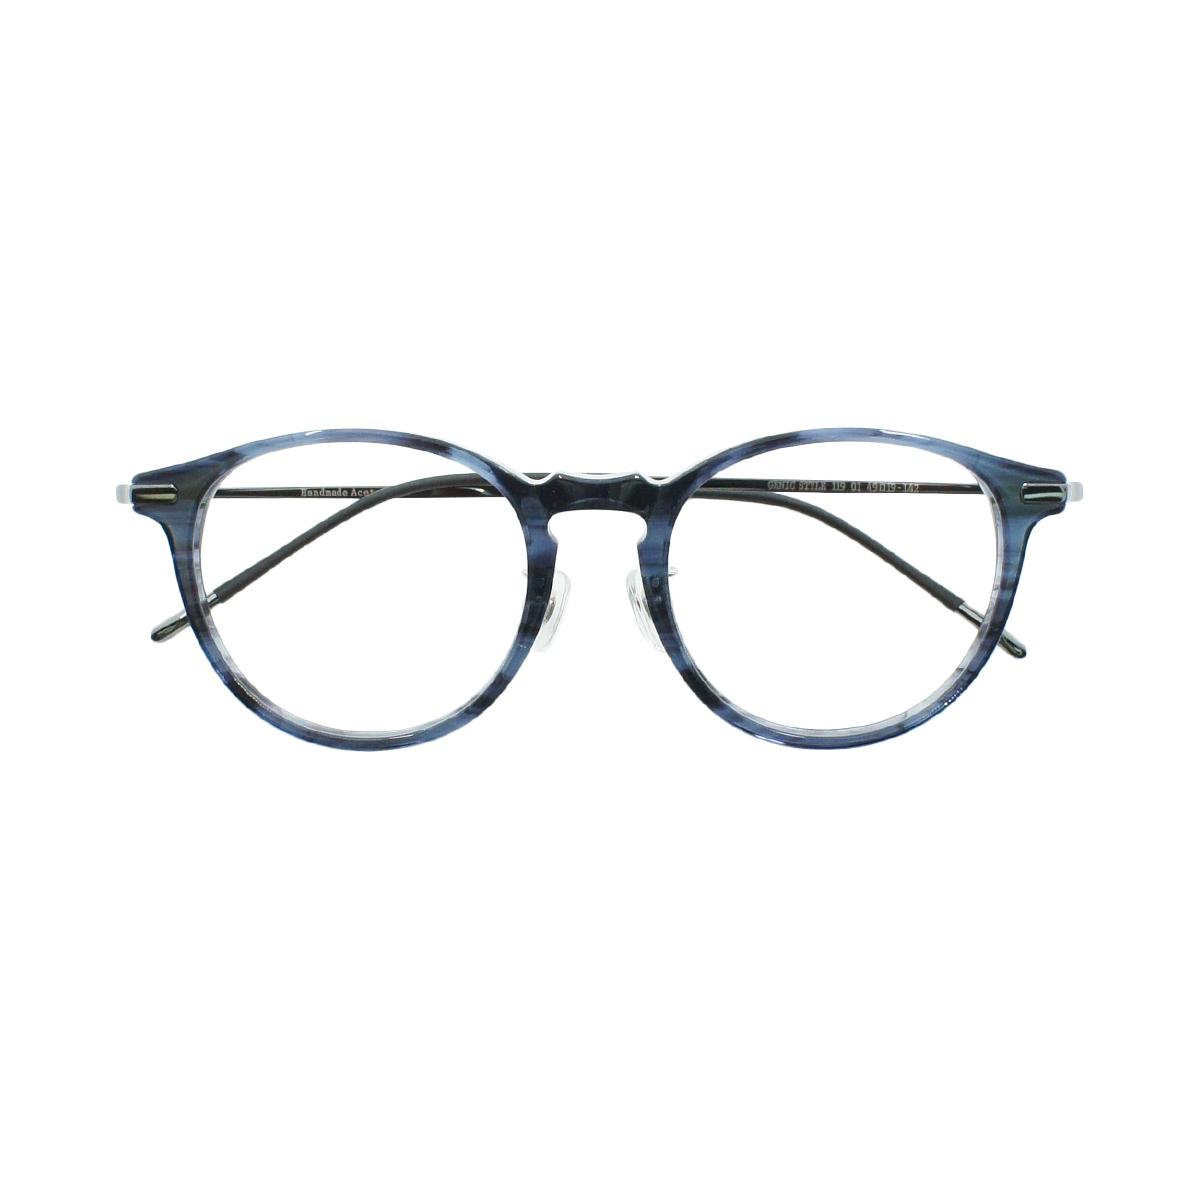 Genic Eyewear Style 119 Col.01